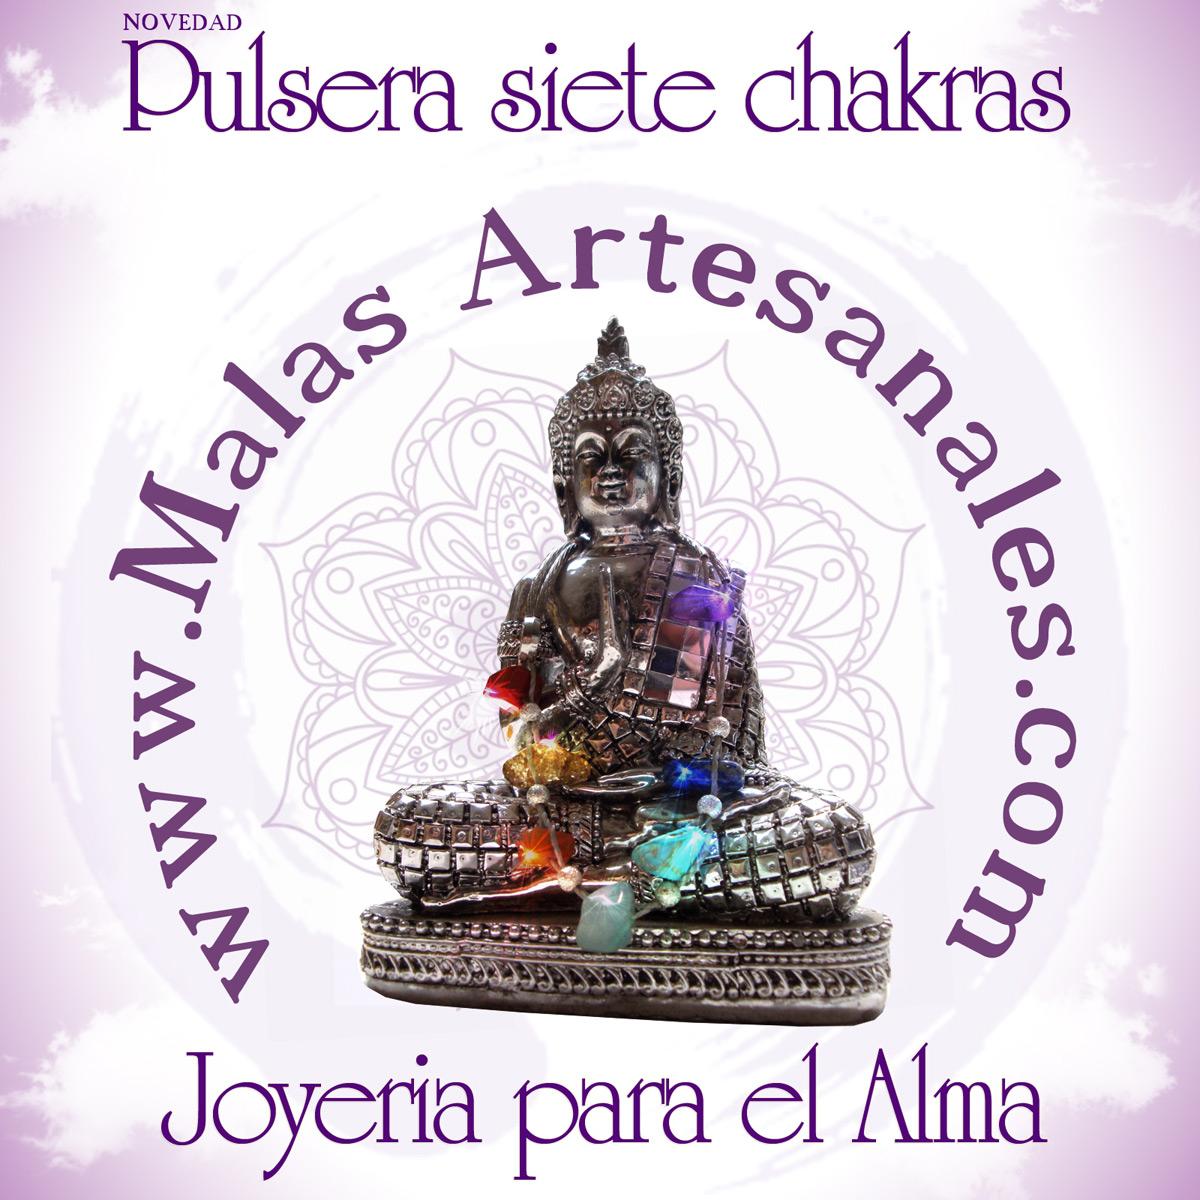 pulsera_espiritual_artesanal_malas_shakra_bouddha_meditacion